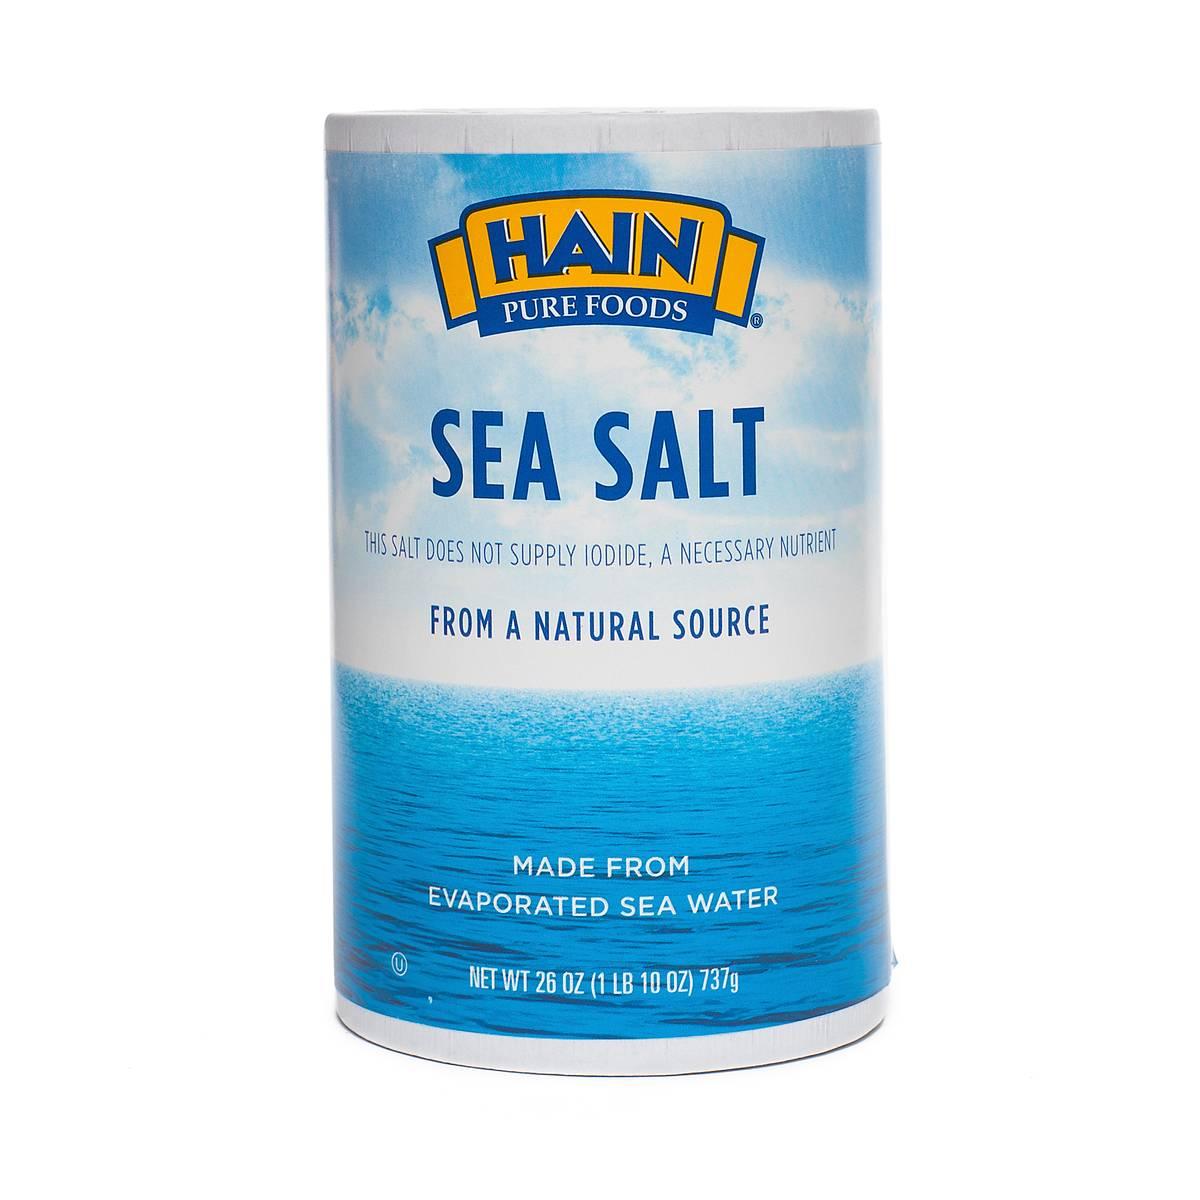 Sea Salt by Hain Pure Foods - Thrive Market